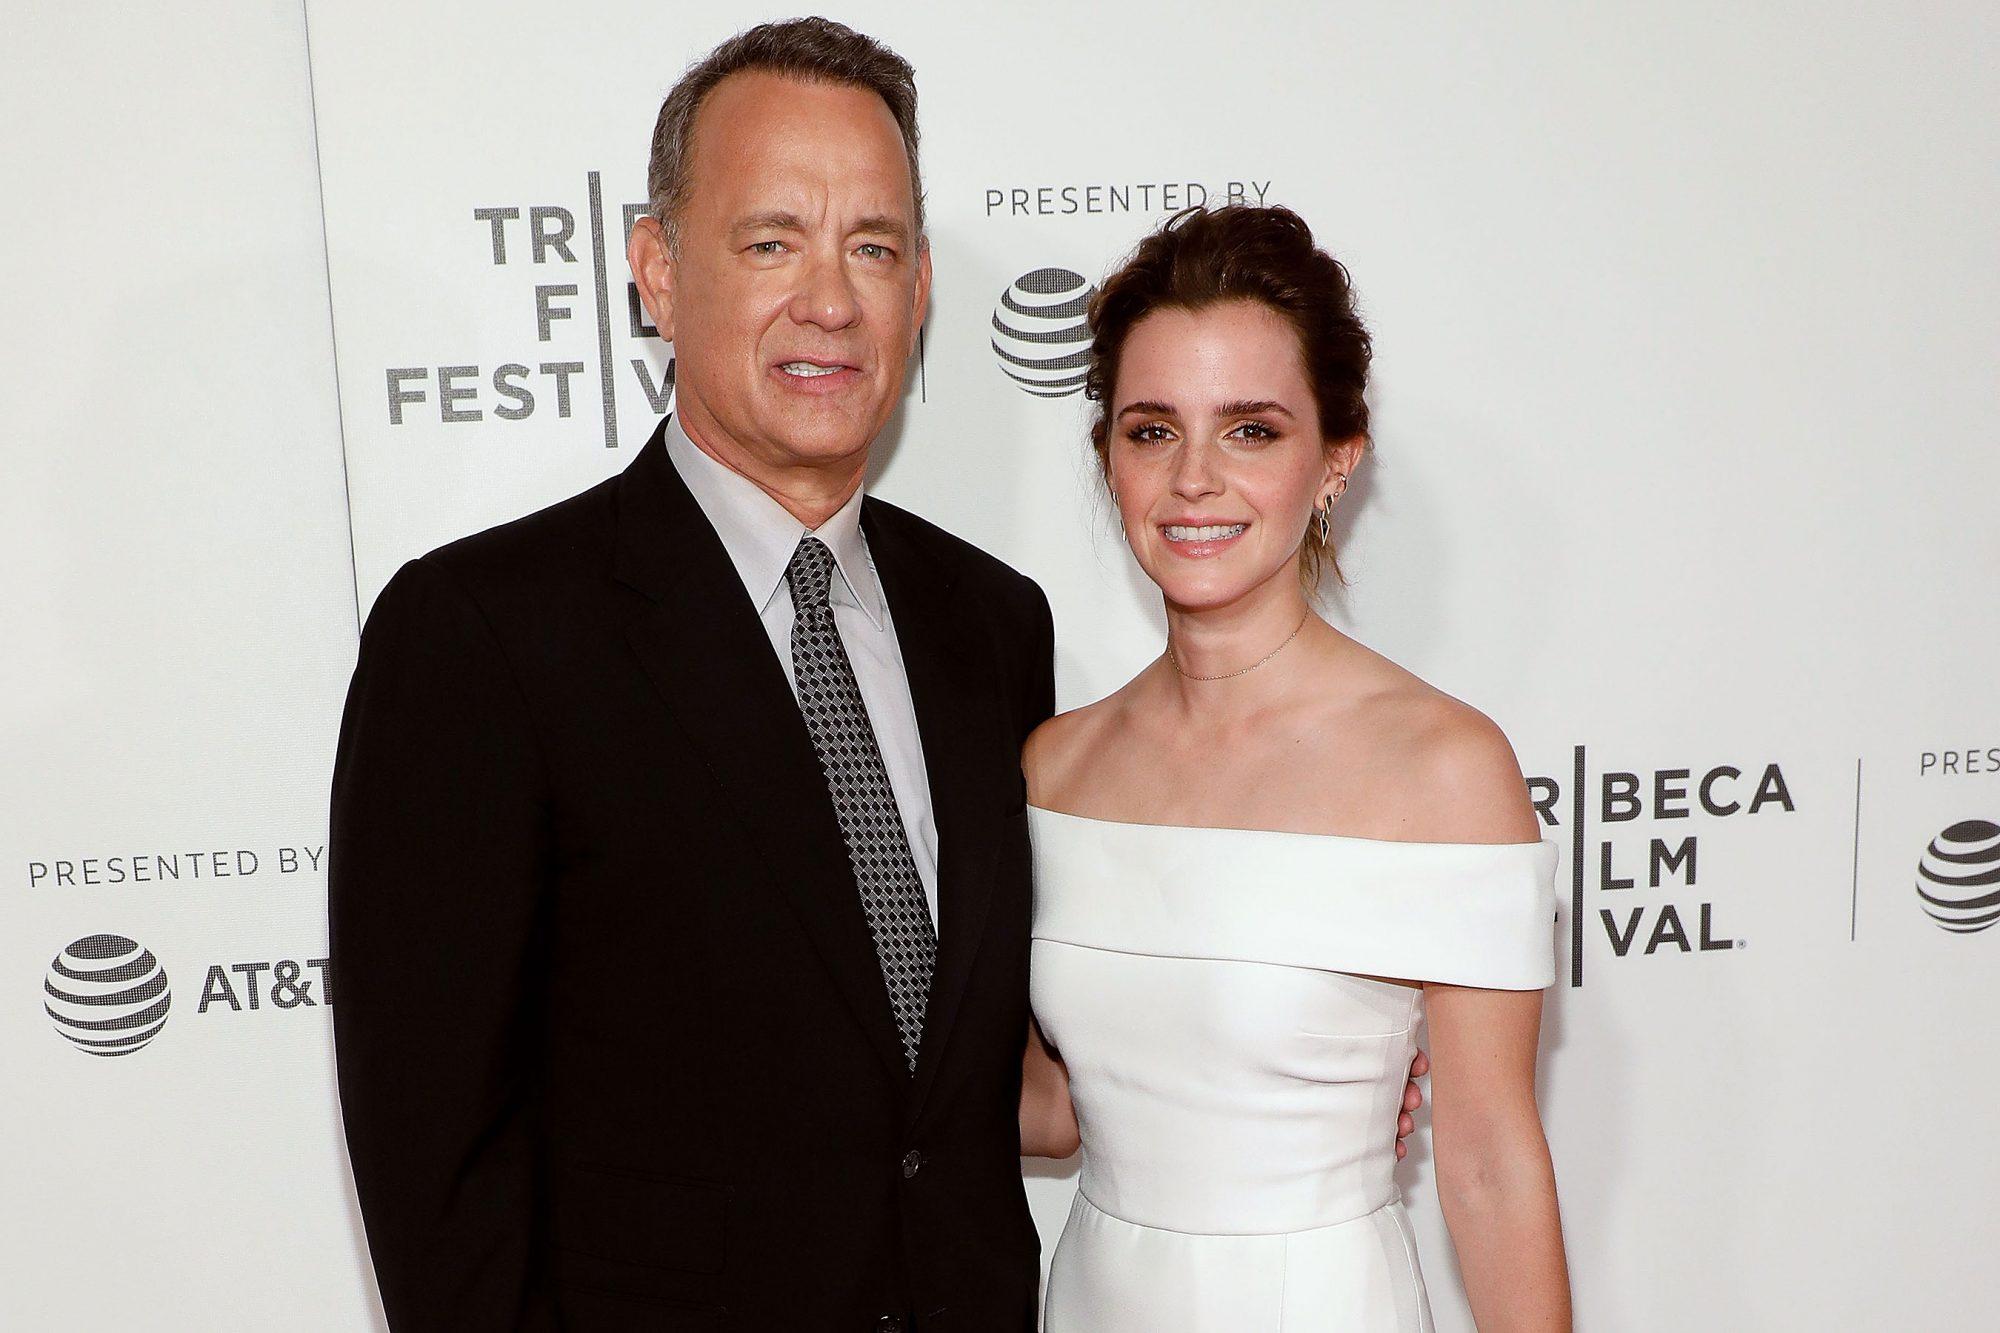 2017 Tribeca Film Festival - Screenings And Parties